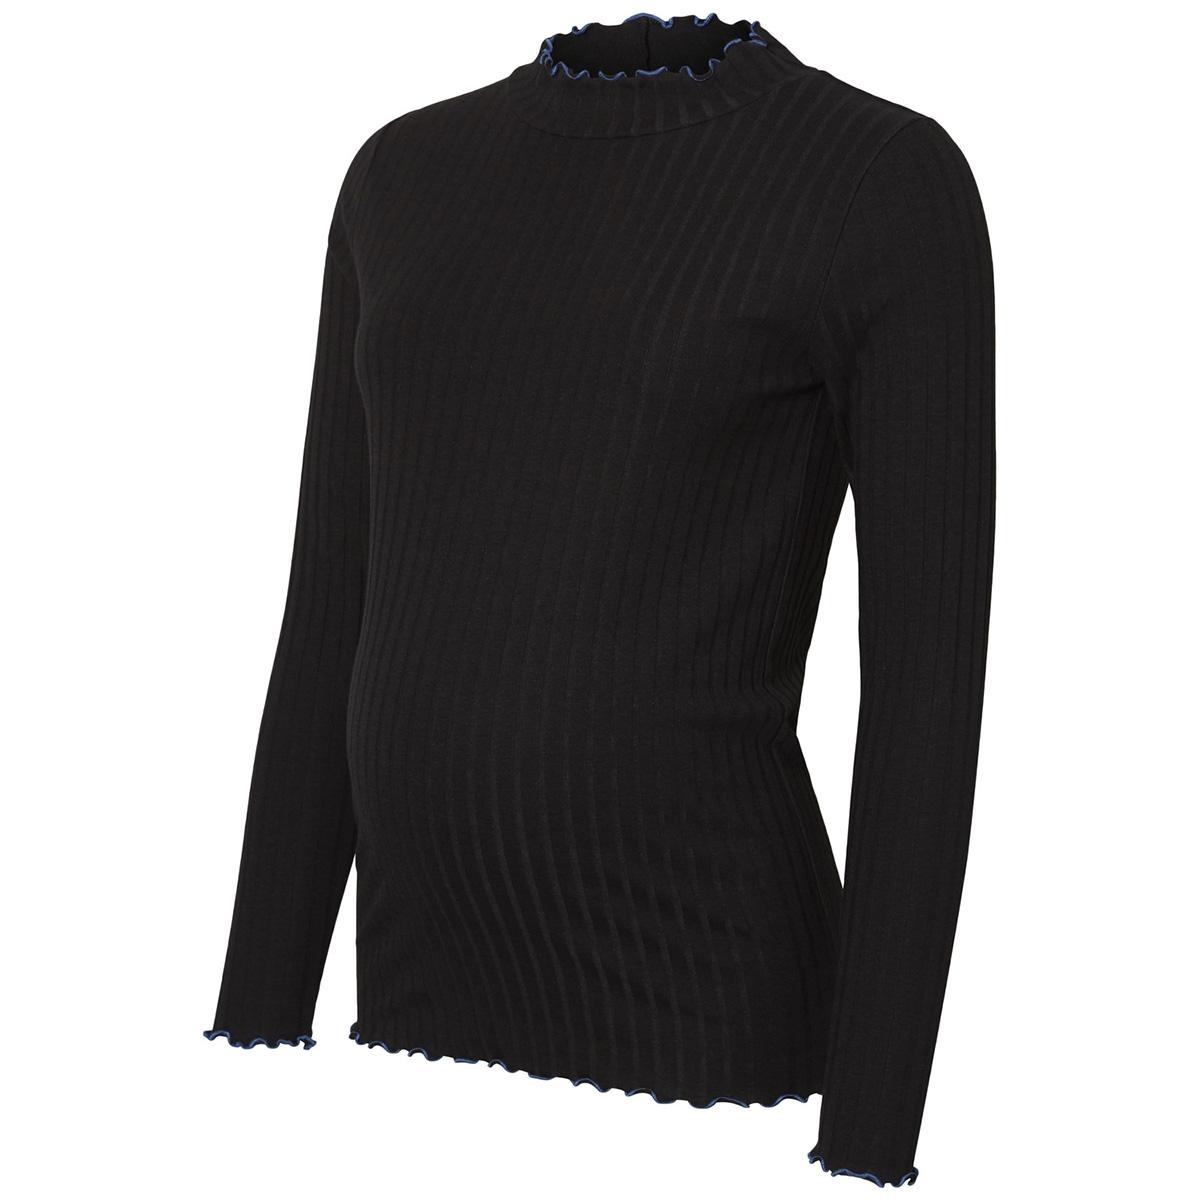 mlancia l/s jersey top a. 20009222 mama-licious positie trui black